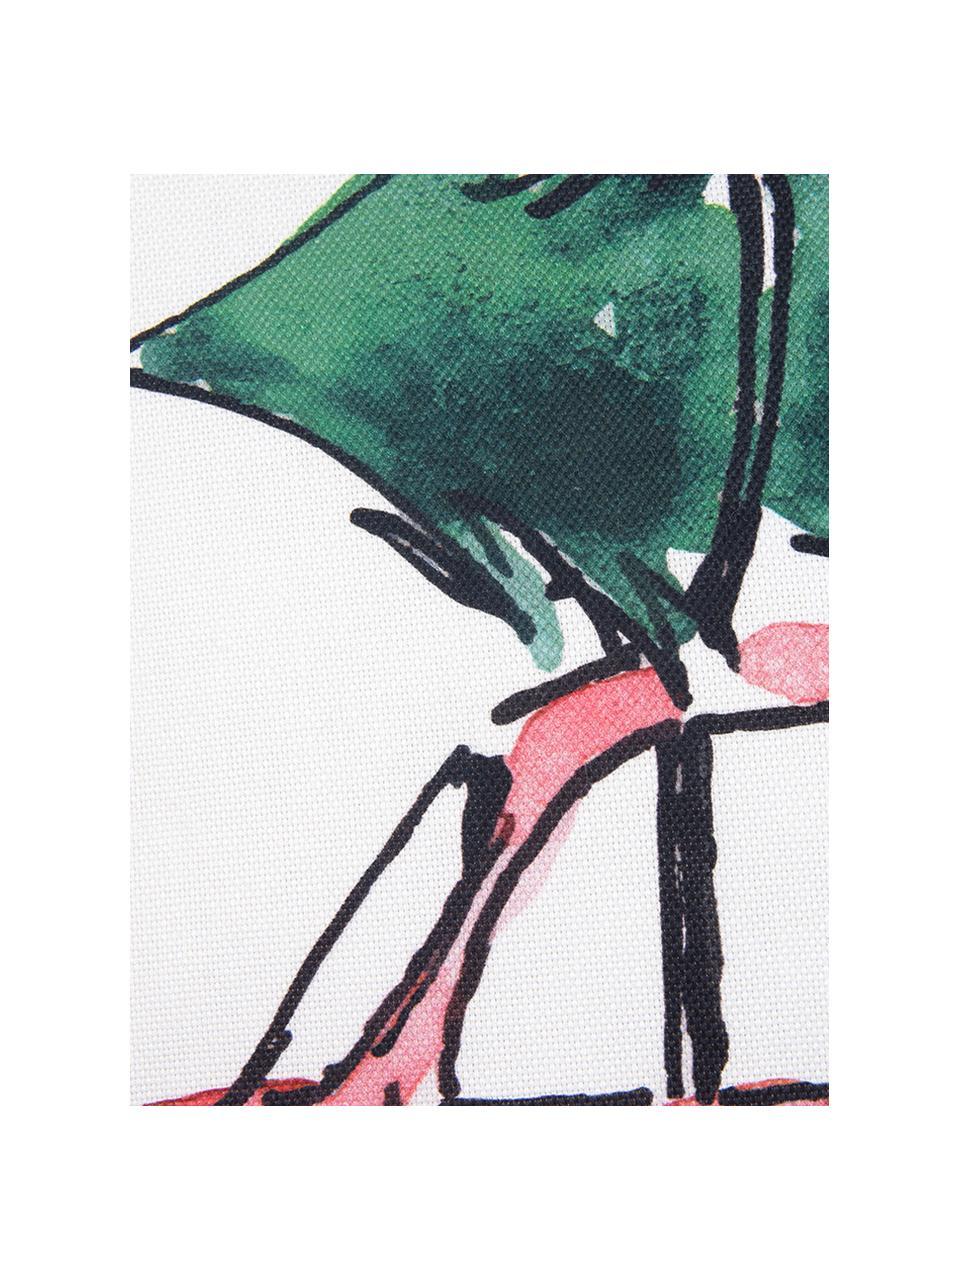 Designer Kissenhülle Xmas Tree von Kera Till, Baumwolle, Kissen: MehrfarbigKederumrandung: Grün, 40 x 40 cm